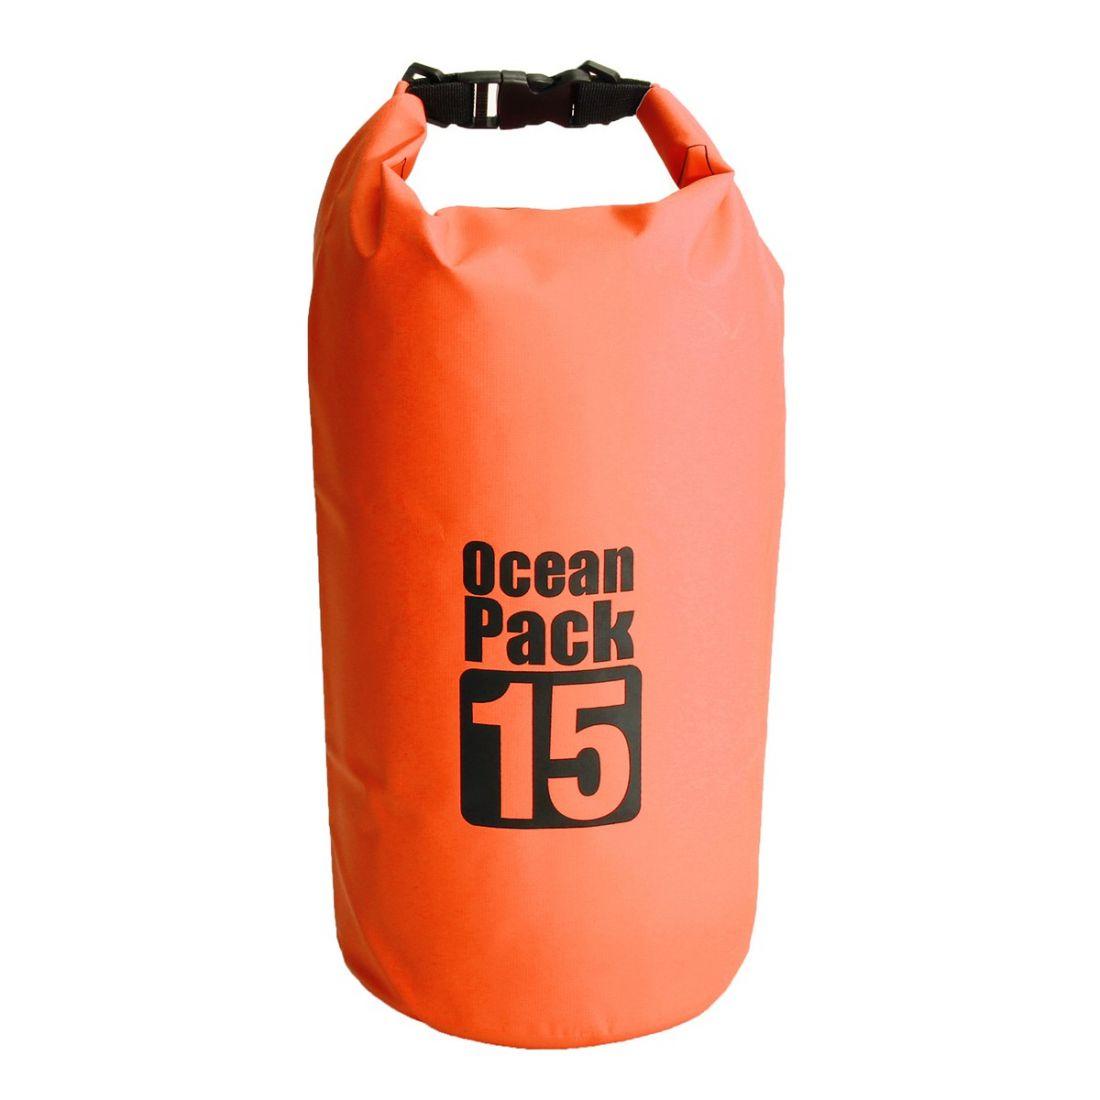 Водонепроницаемая Сумка-Мешок Ocean Pack, 15 L, Цвет Оранжевый